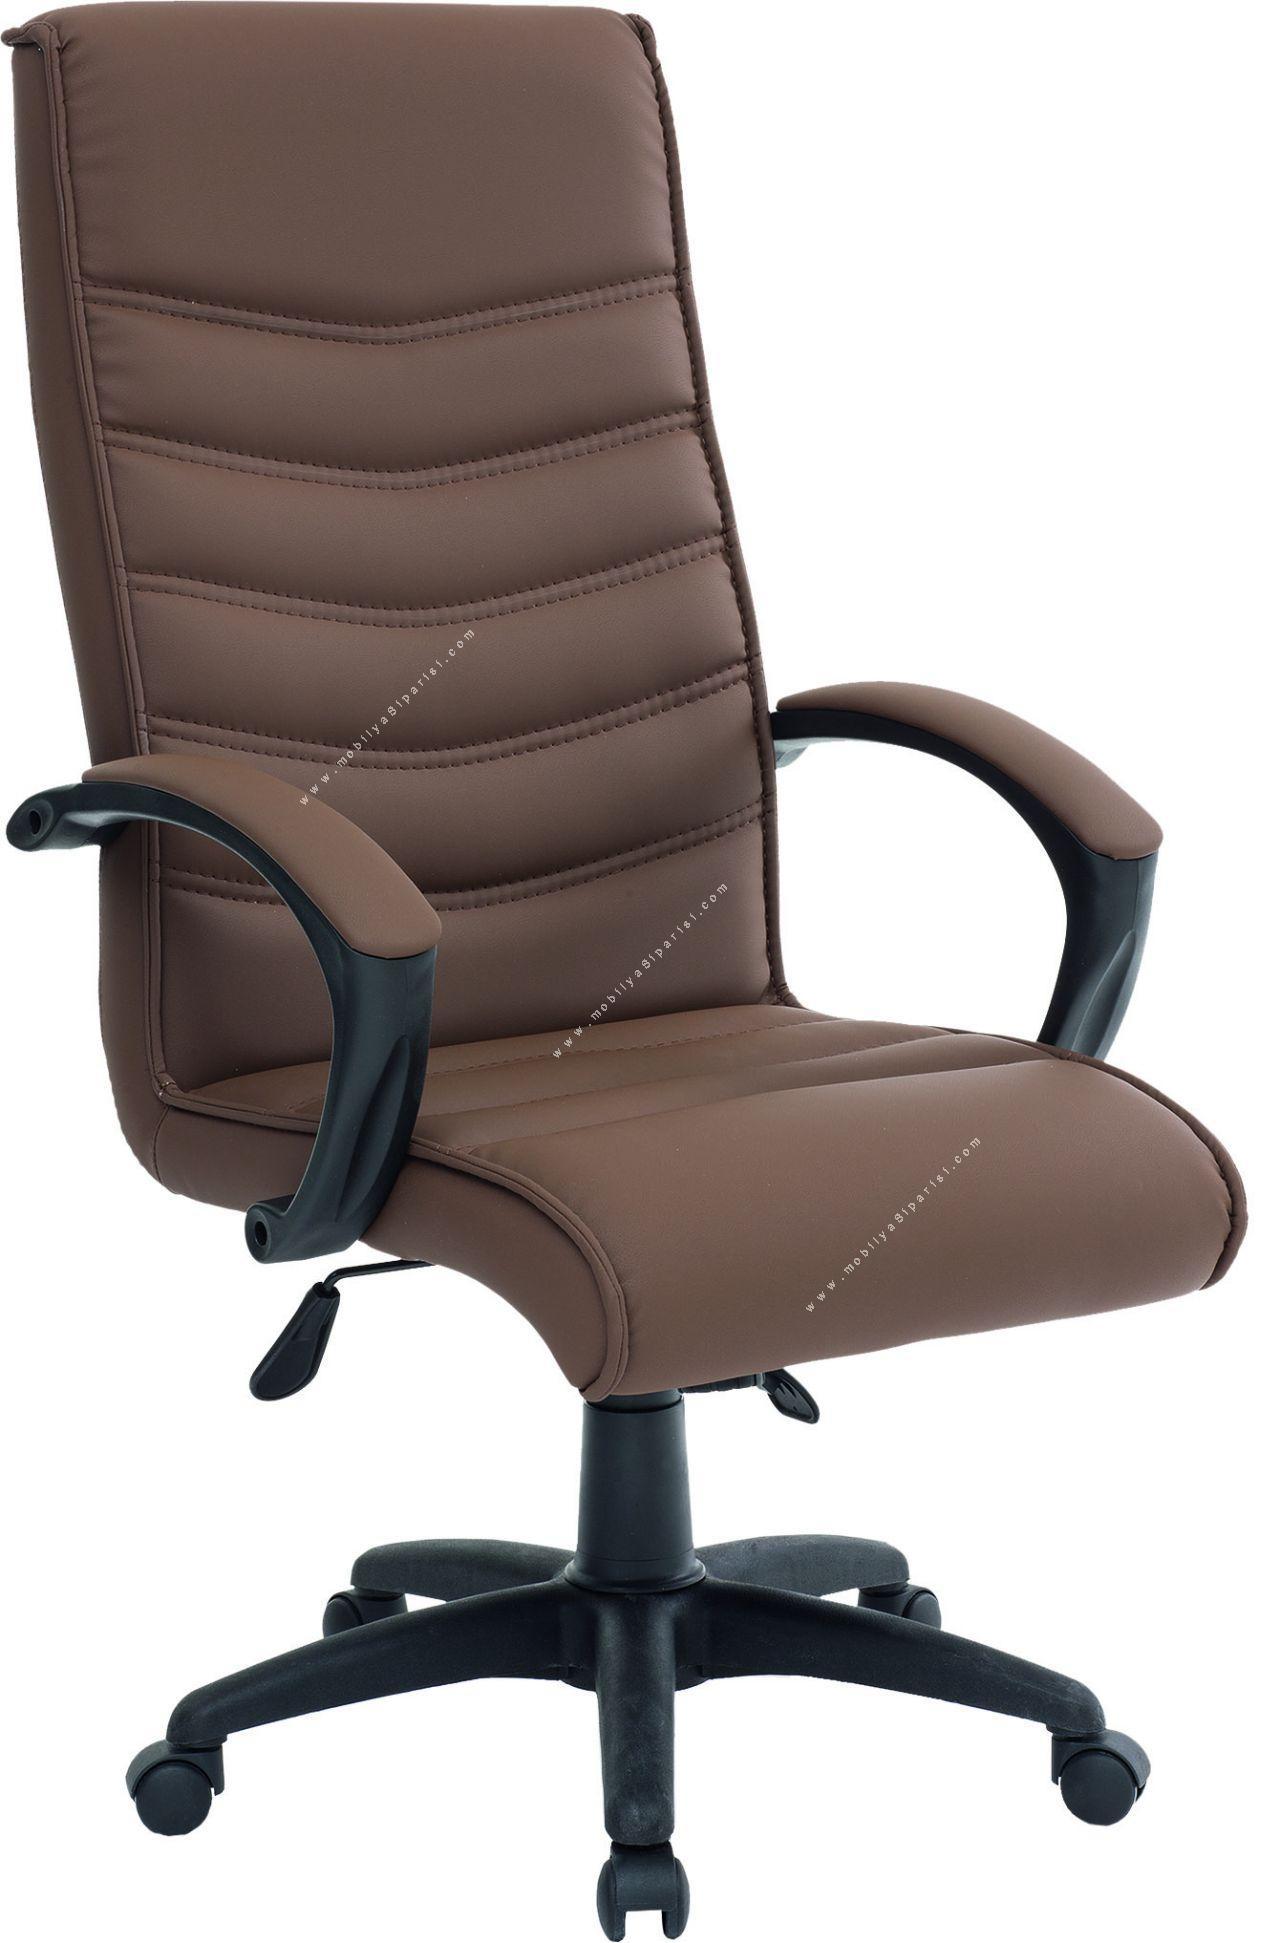 vertu plastik yönetici ofis koltuğu